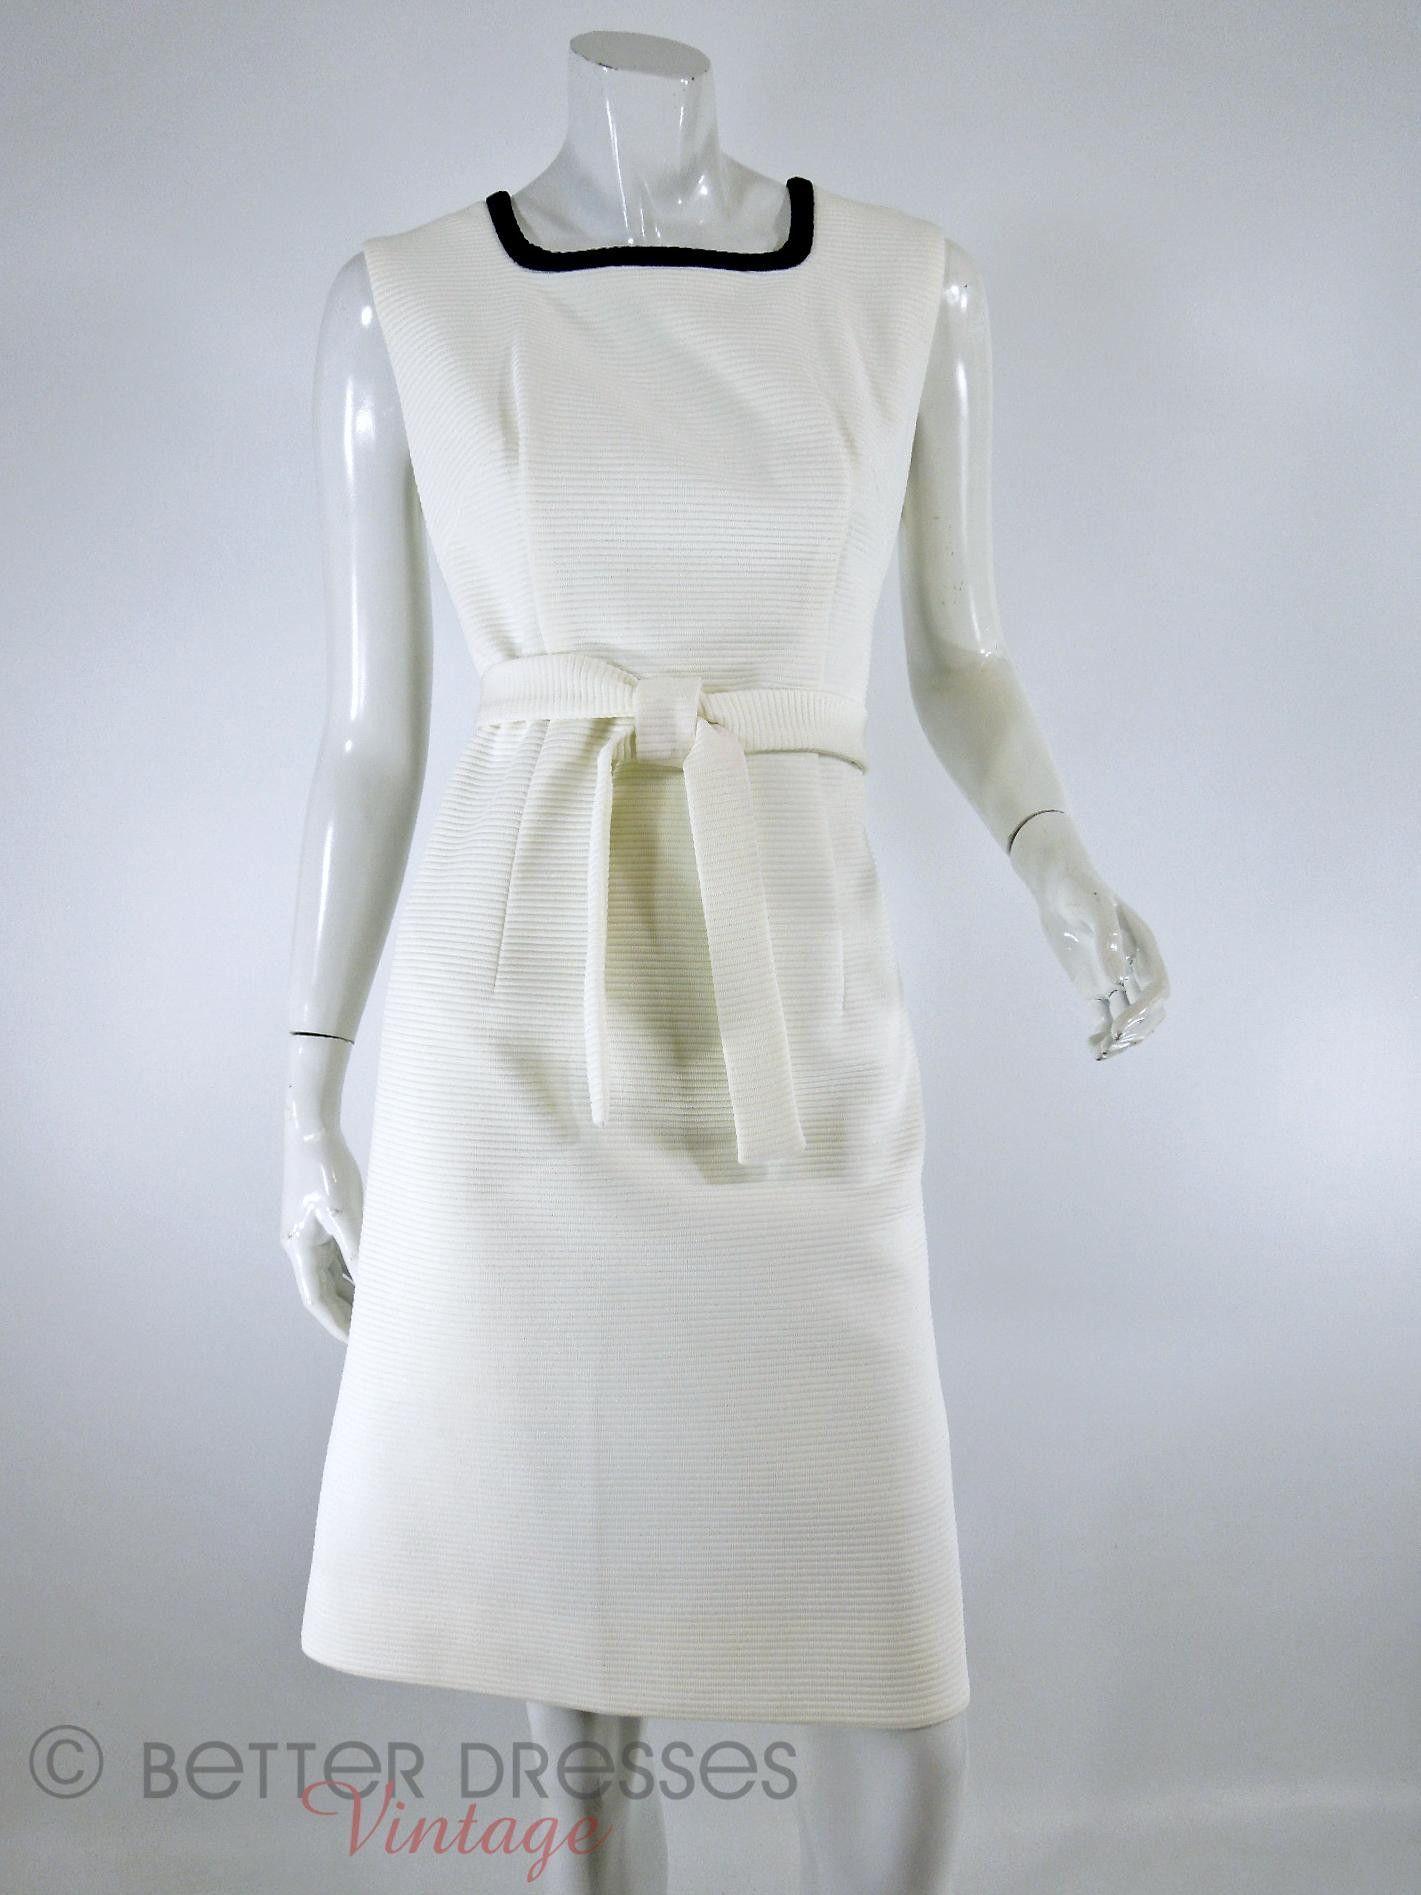 b14c2d2f37f7e9 Princess seamed sleeveless shift dress has navy blue at squared. Vintage  1960s Lilli Ann Mod Dress & Coat Set in Red White ...